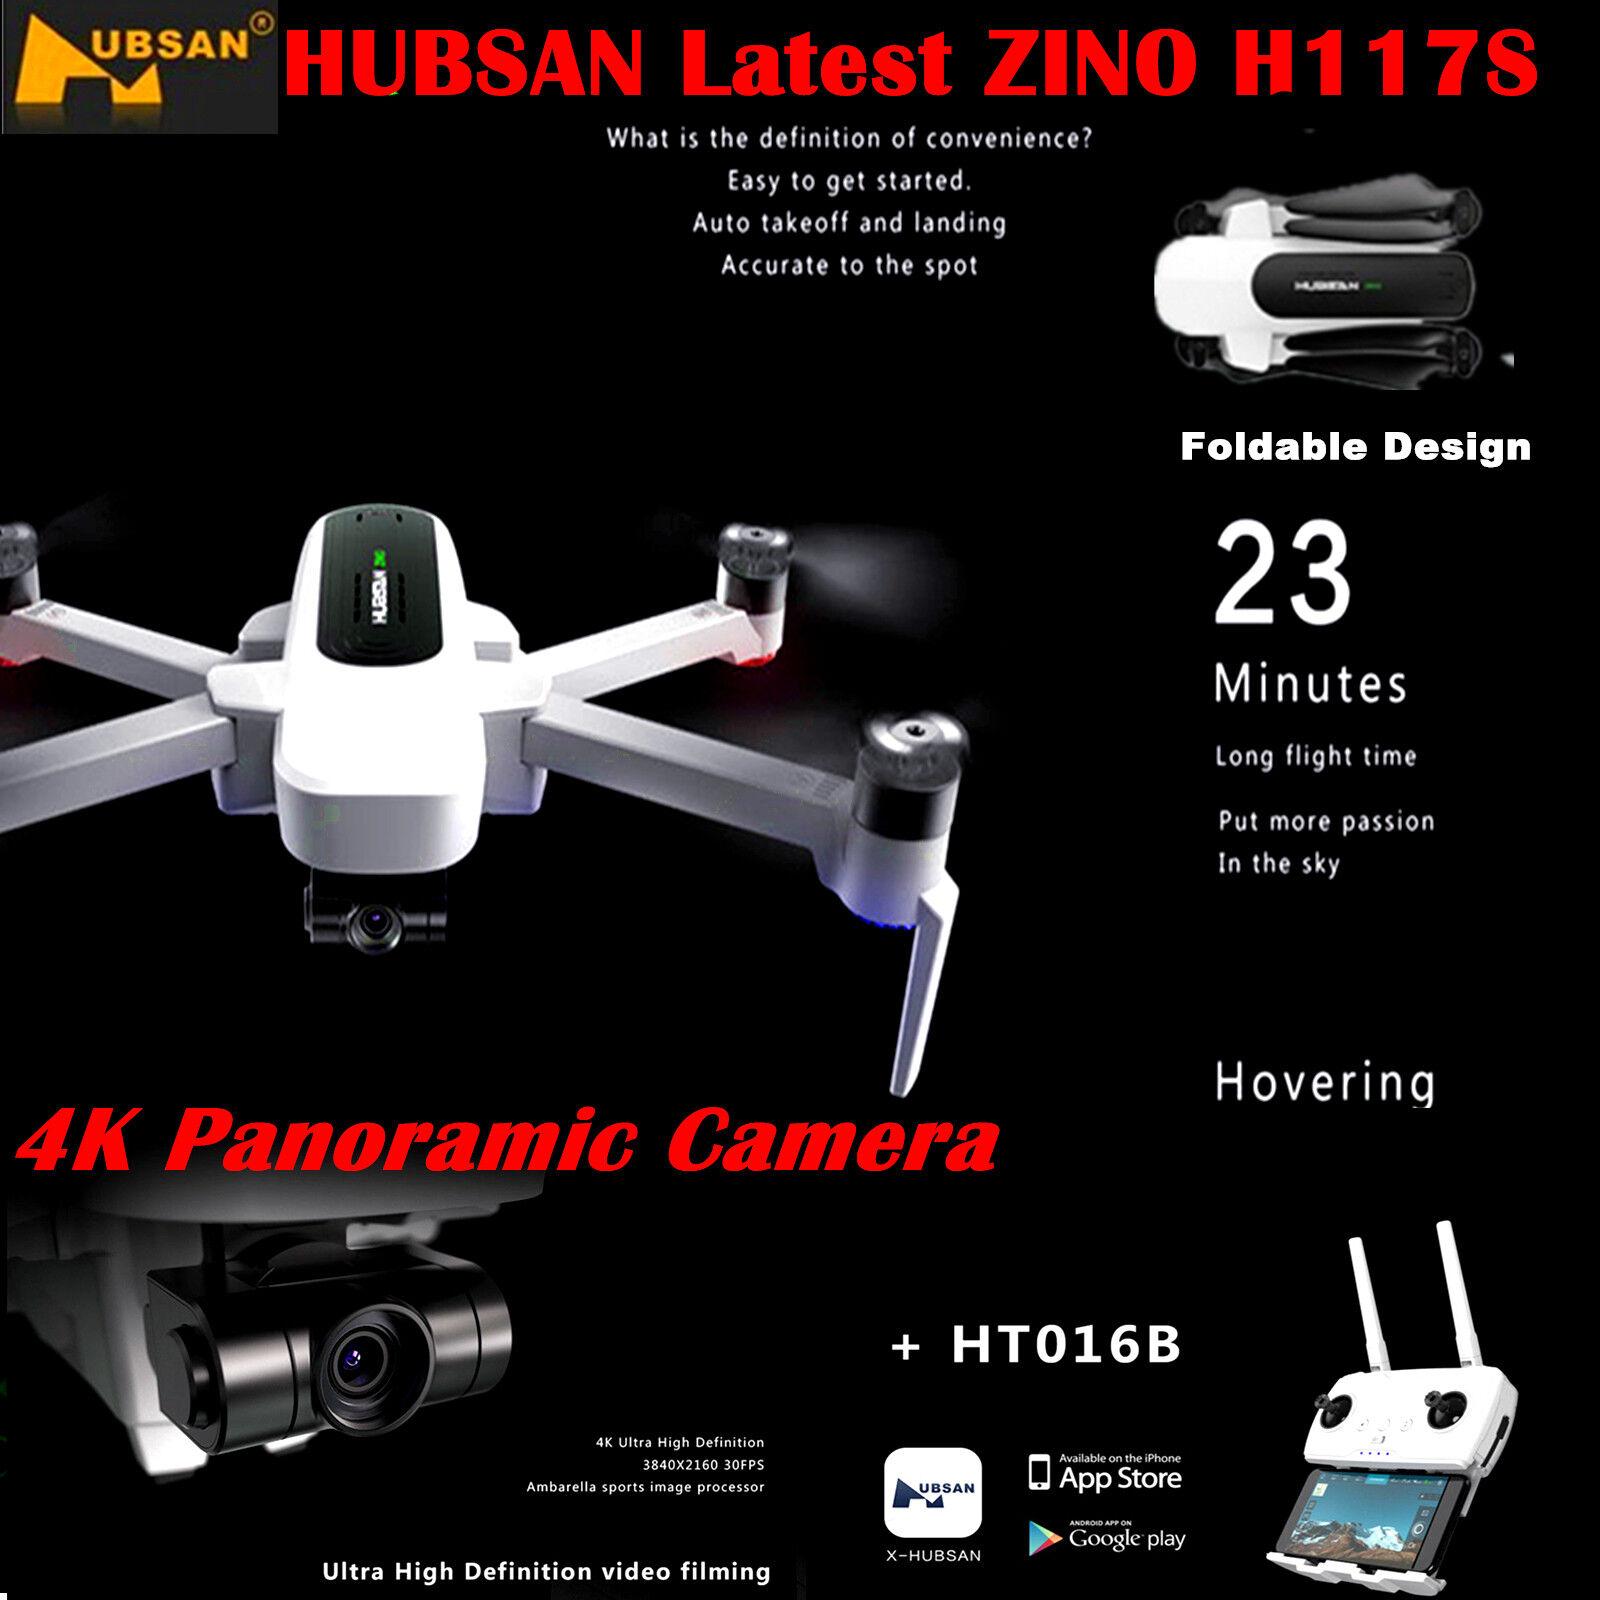 Hubsan X4 H117S ZINO Drone FPV 4K HD Cámara Plegable Cuadricóptero 3 Cardán Gps Listo Para Volar